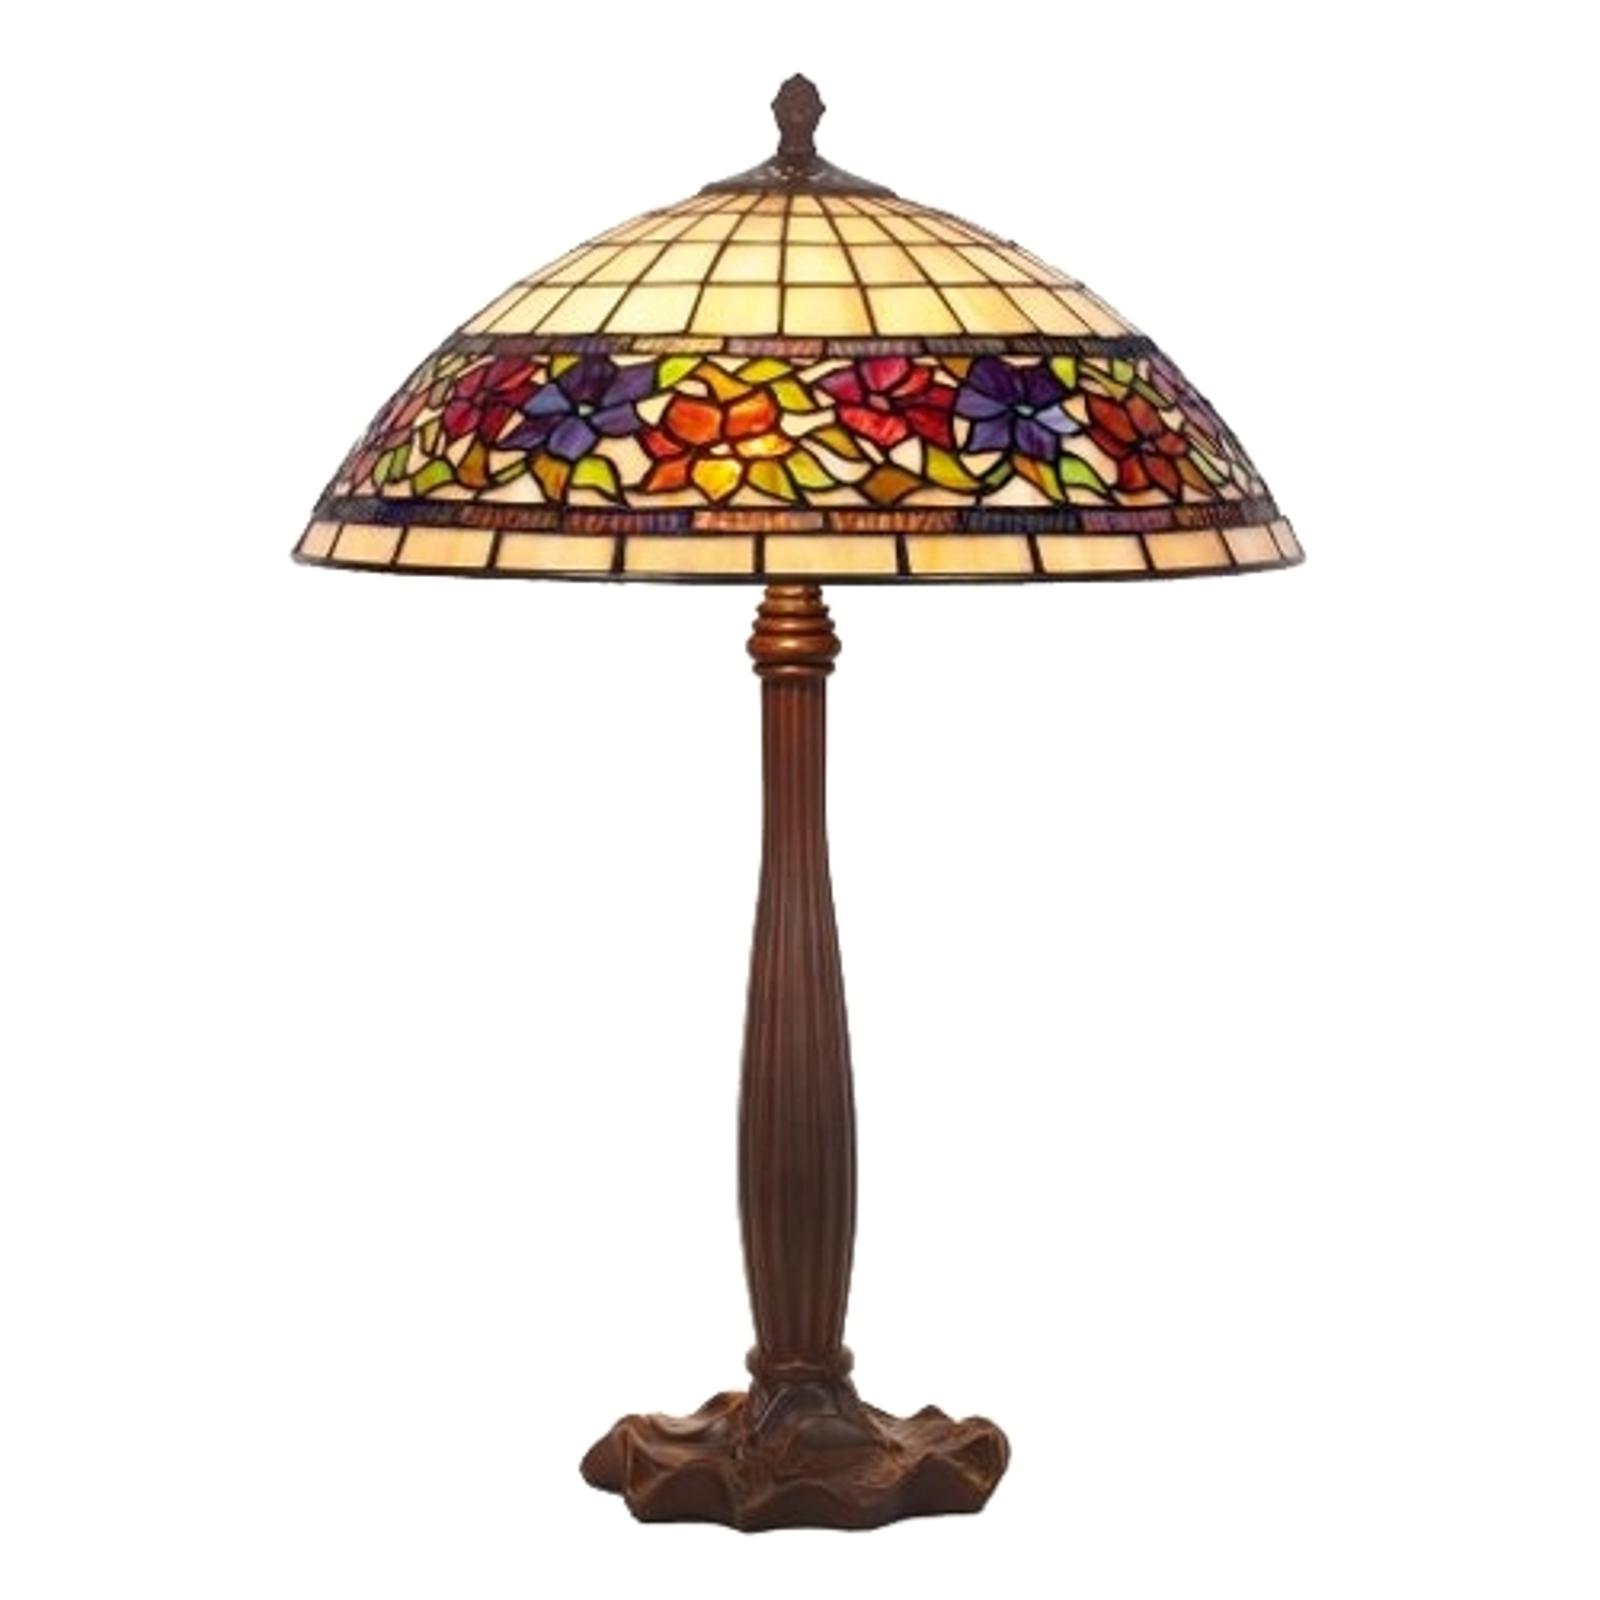 Aparte tafellamp FLORA in Tiffany-stijl